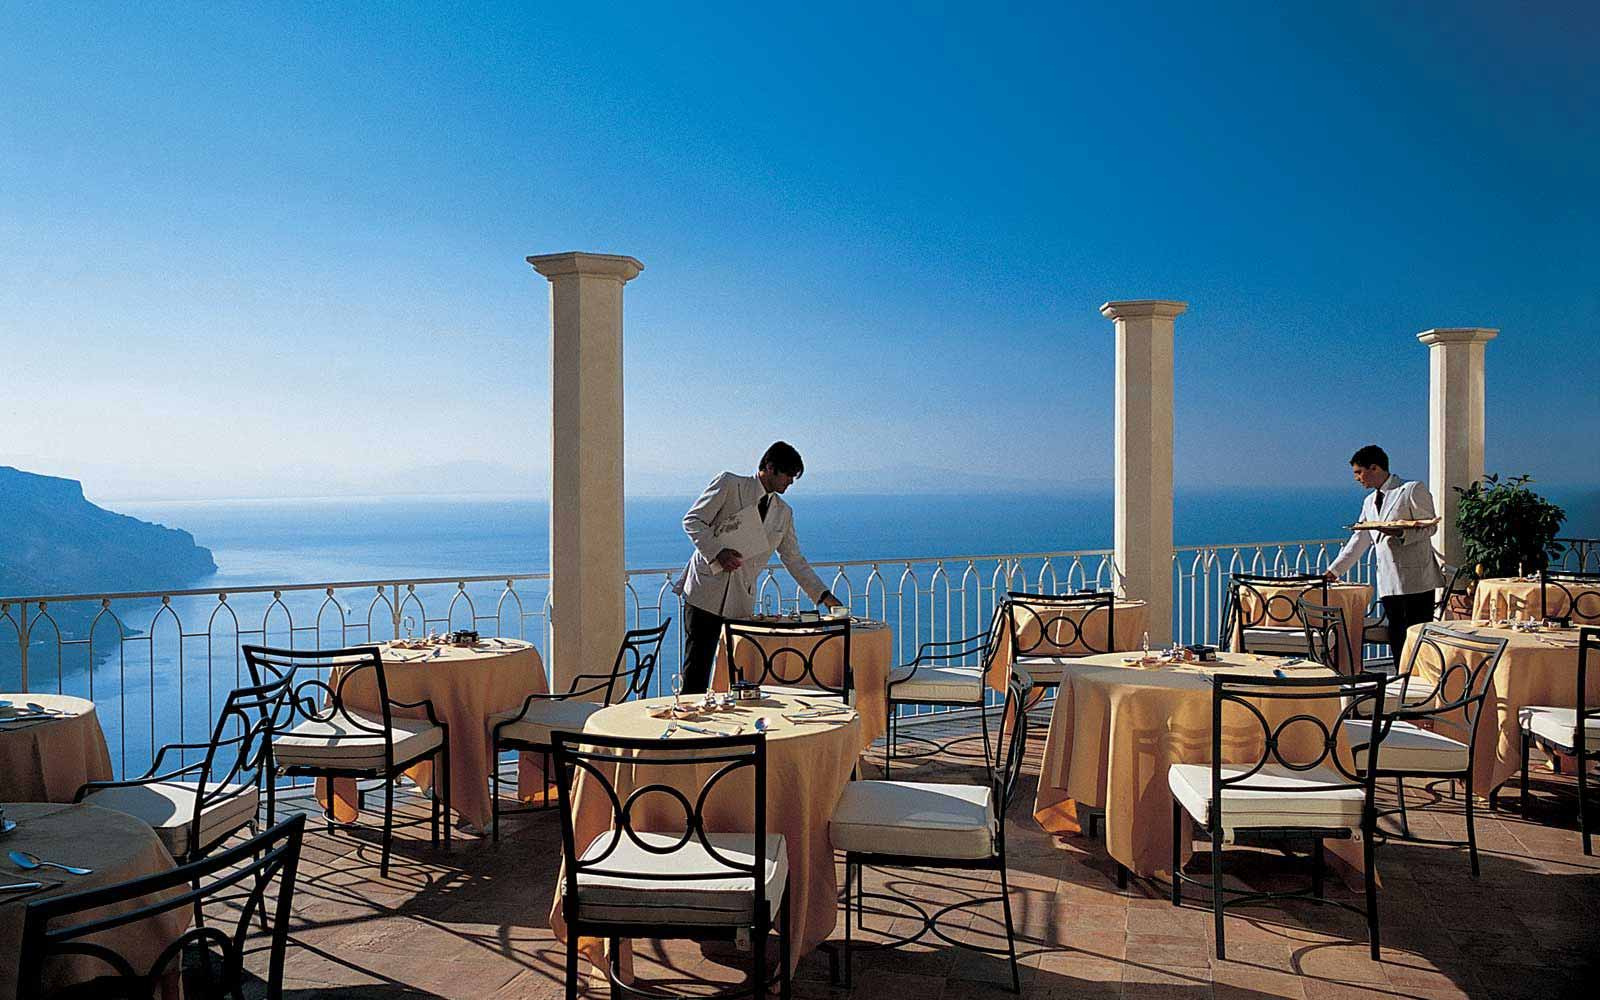 Restaurant at Belmond Hotel Caruso